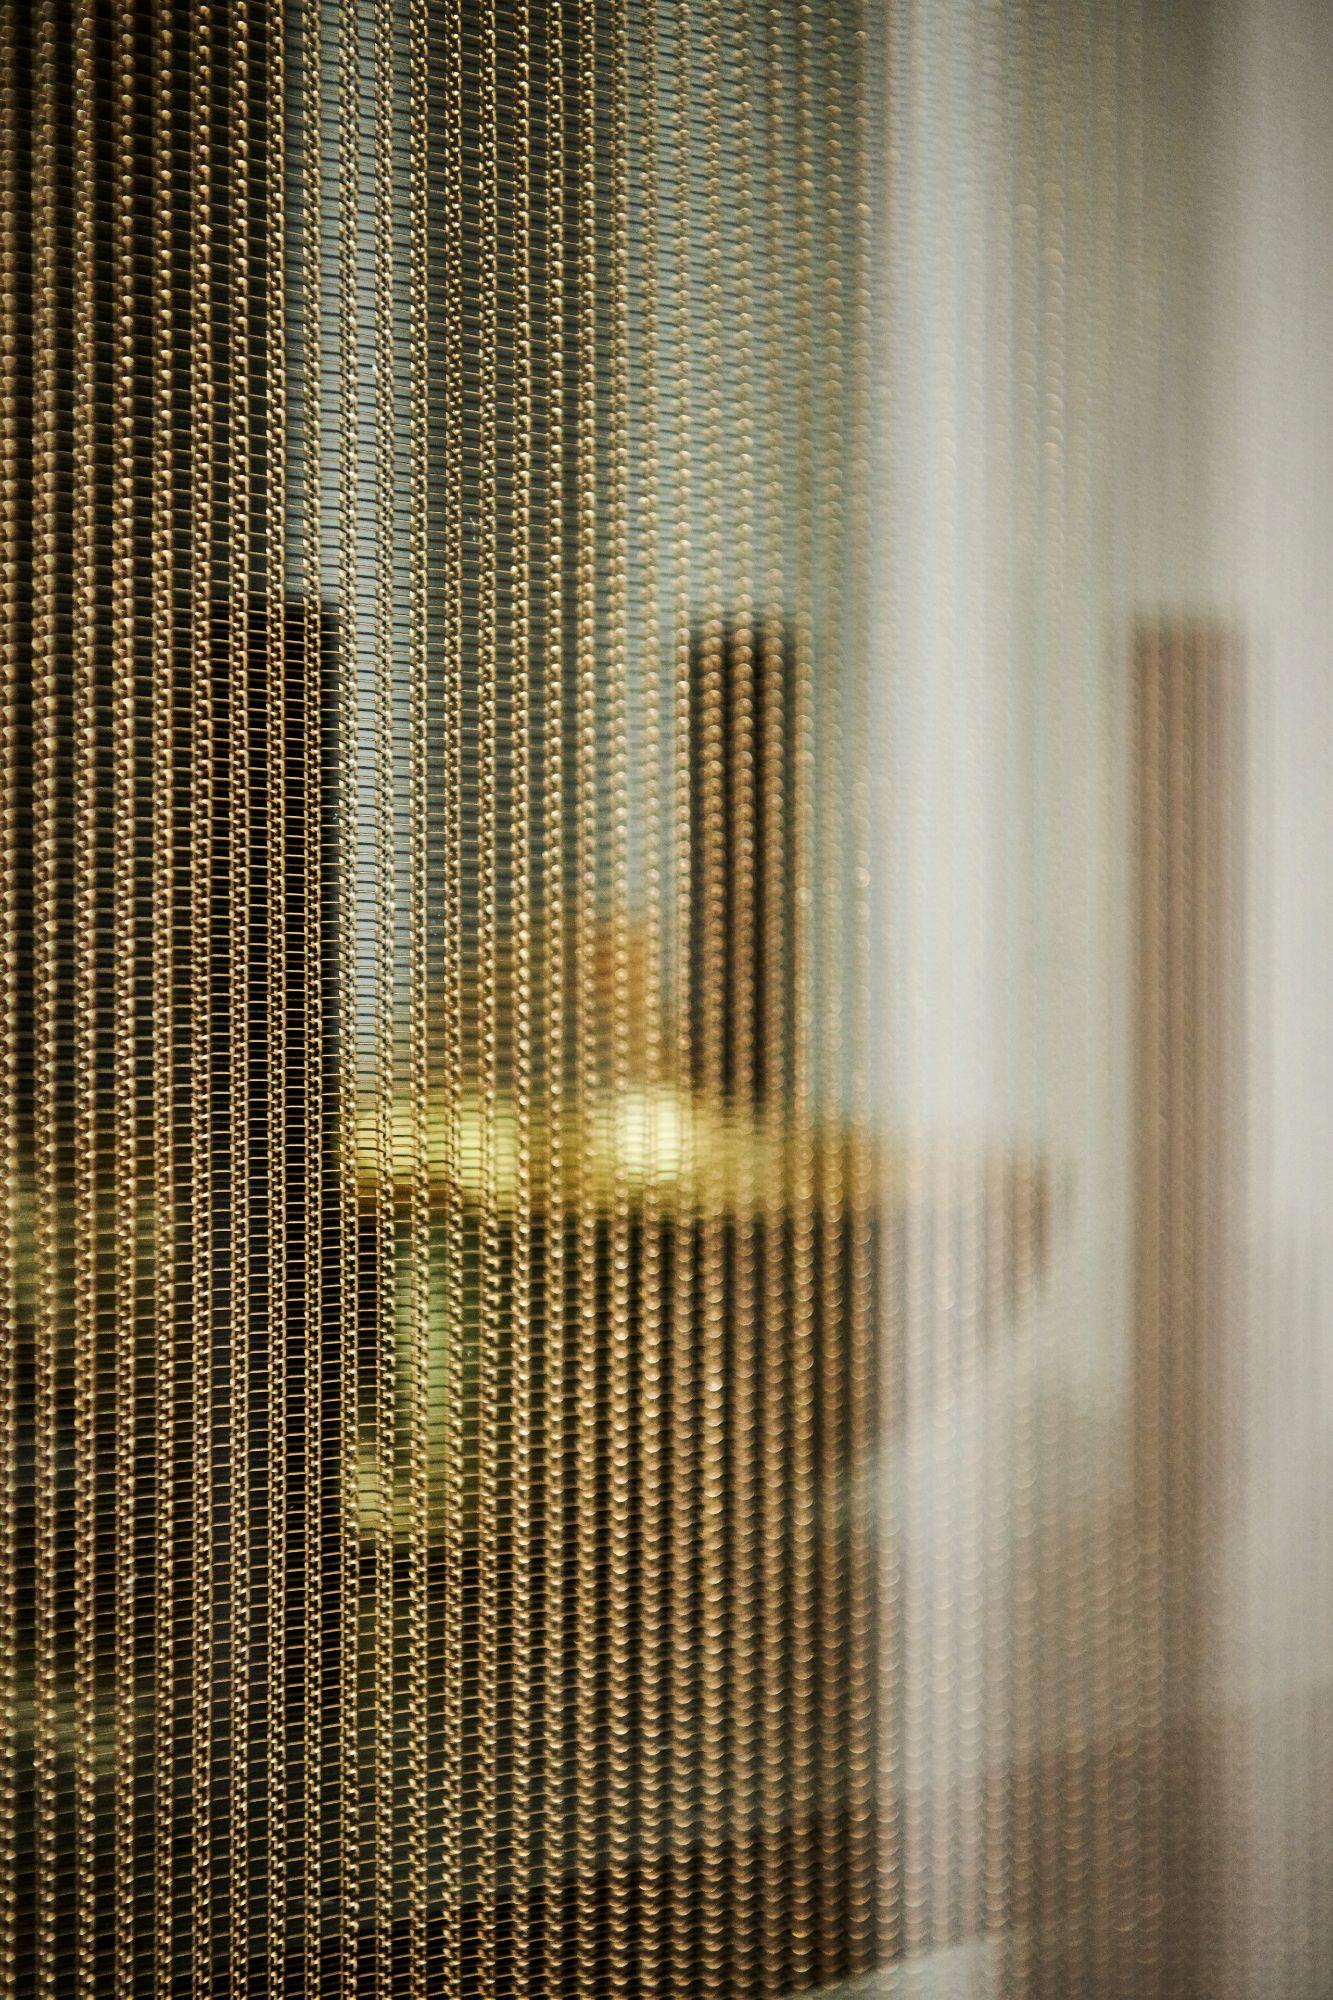 closeup of eggersmanns' exclusive Interlink glass finish in bronze